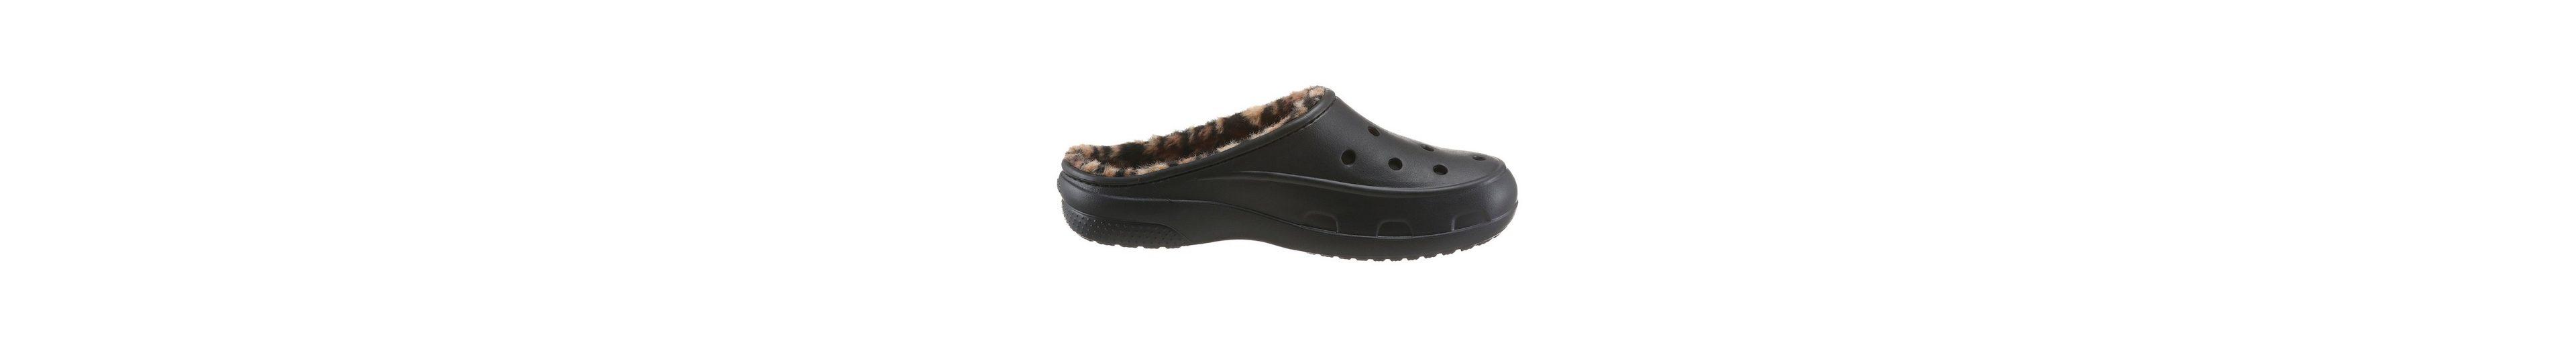 Crocs Clog, mit Warmfutter